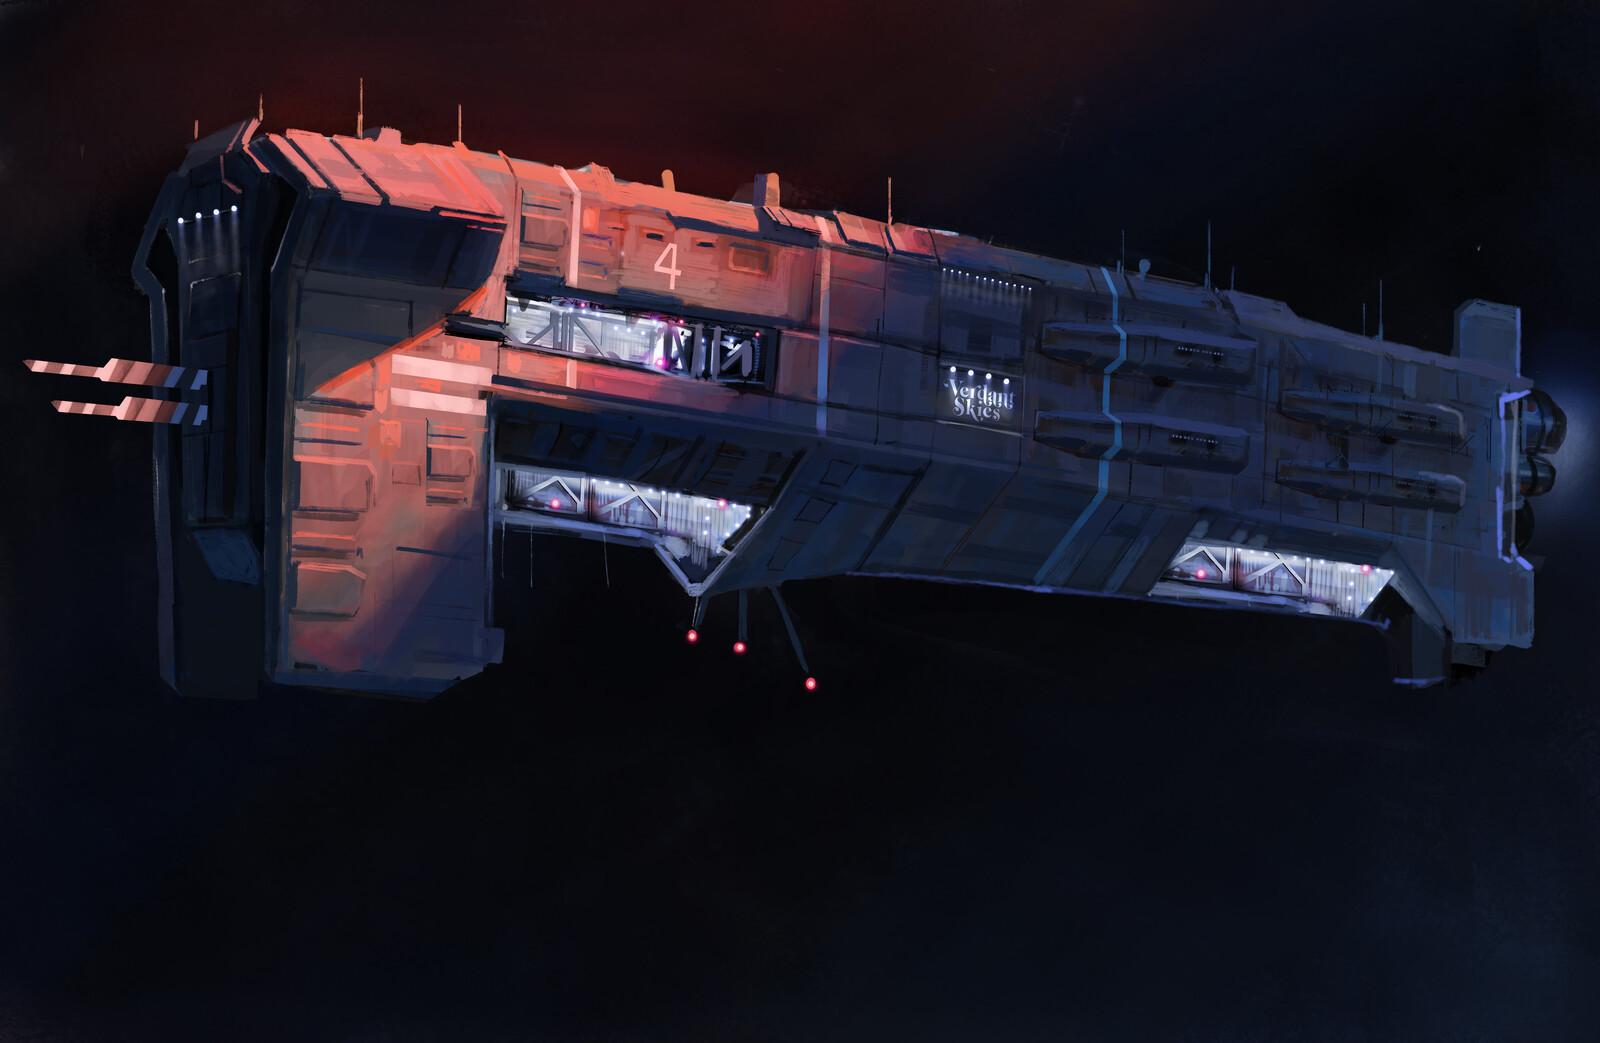 Cargoship number 1